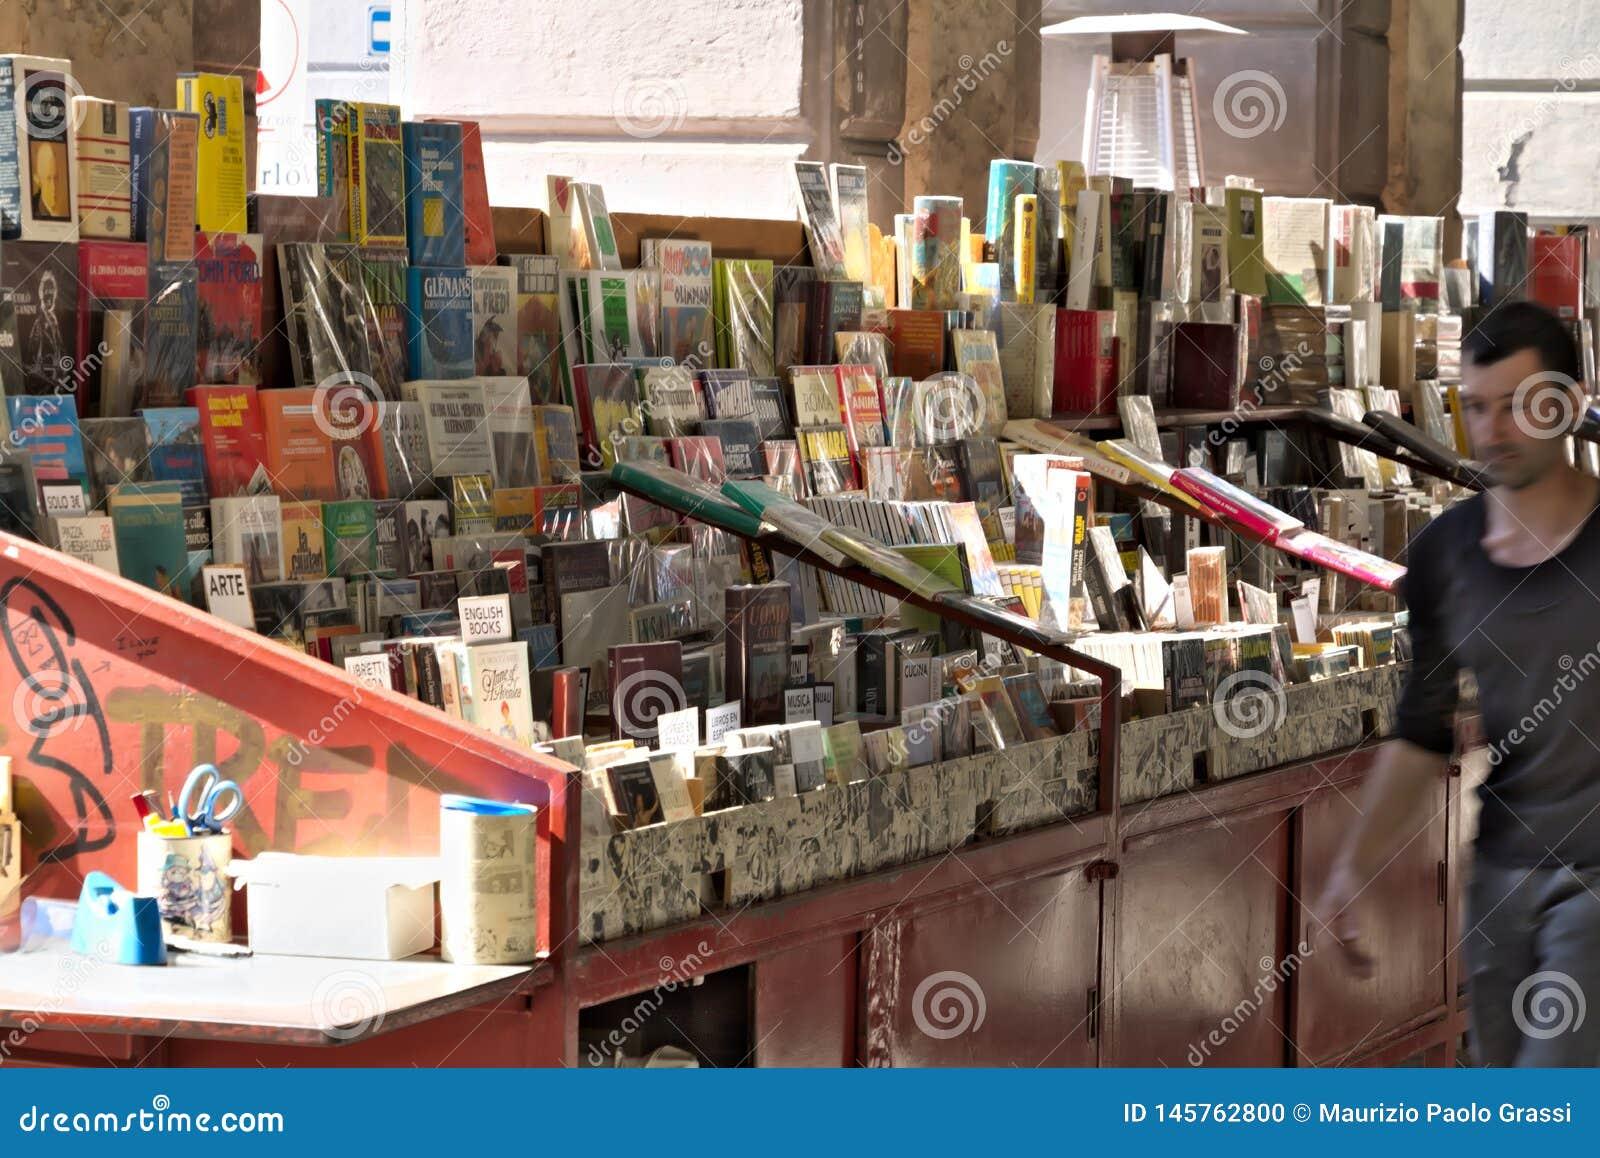 G?nova Banco de libros usados en la plaza Colombo